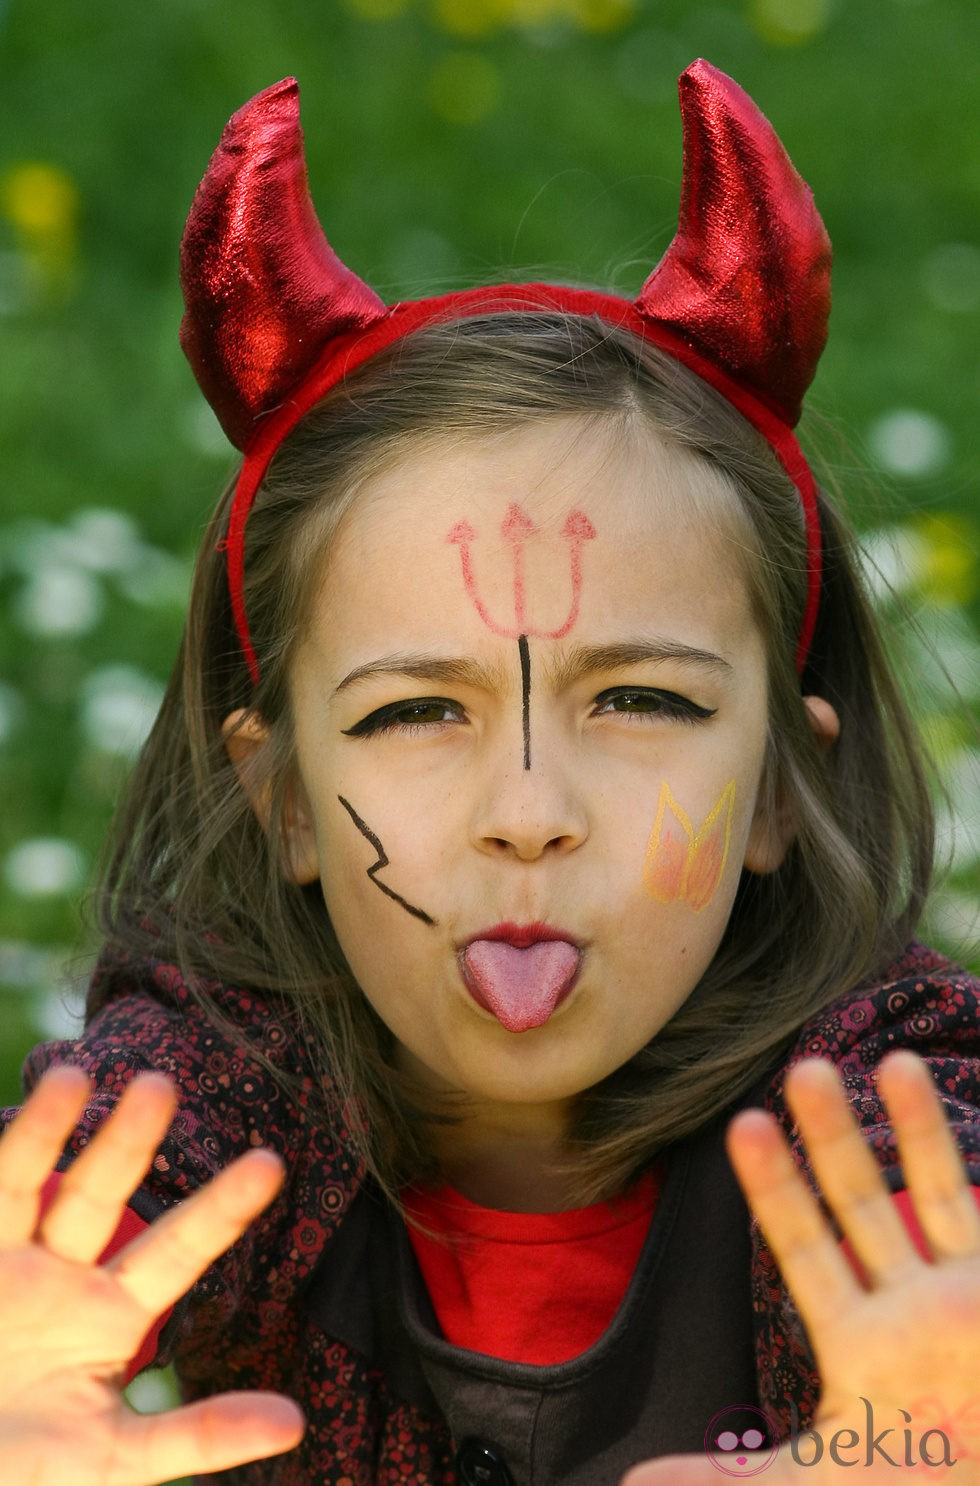 Maquillaje de diablo para ni a maquillaje de halloween for Cara pintada diablo